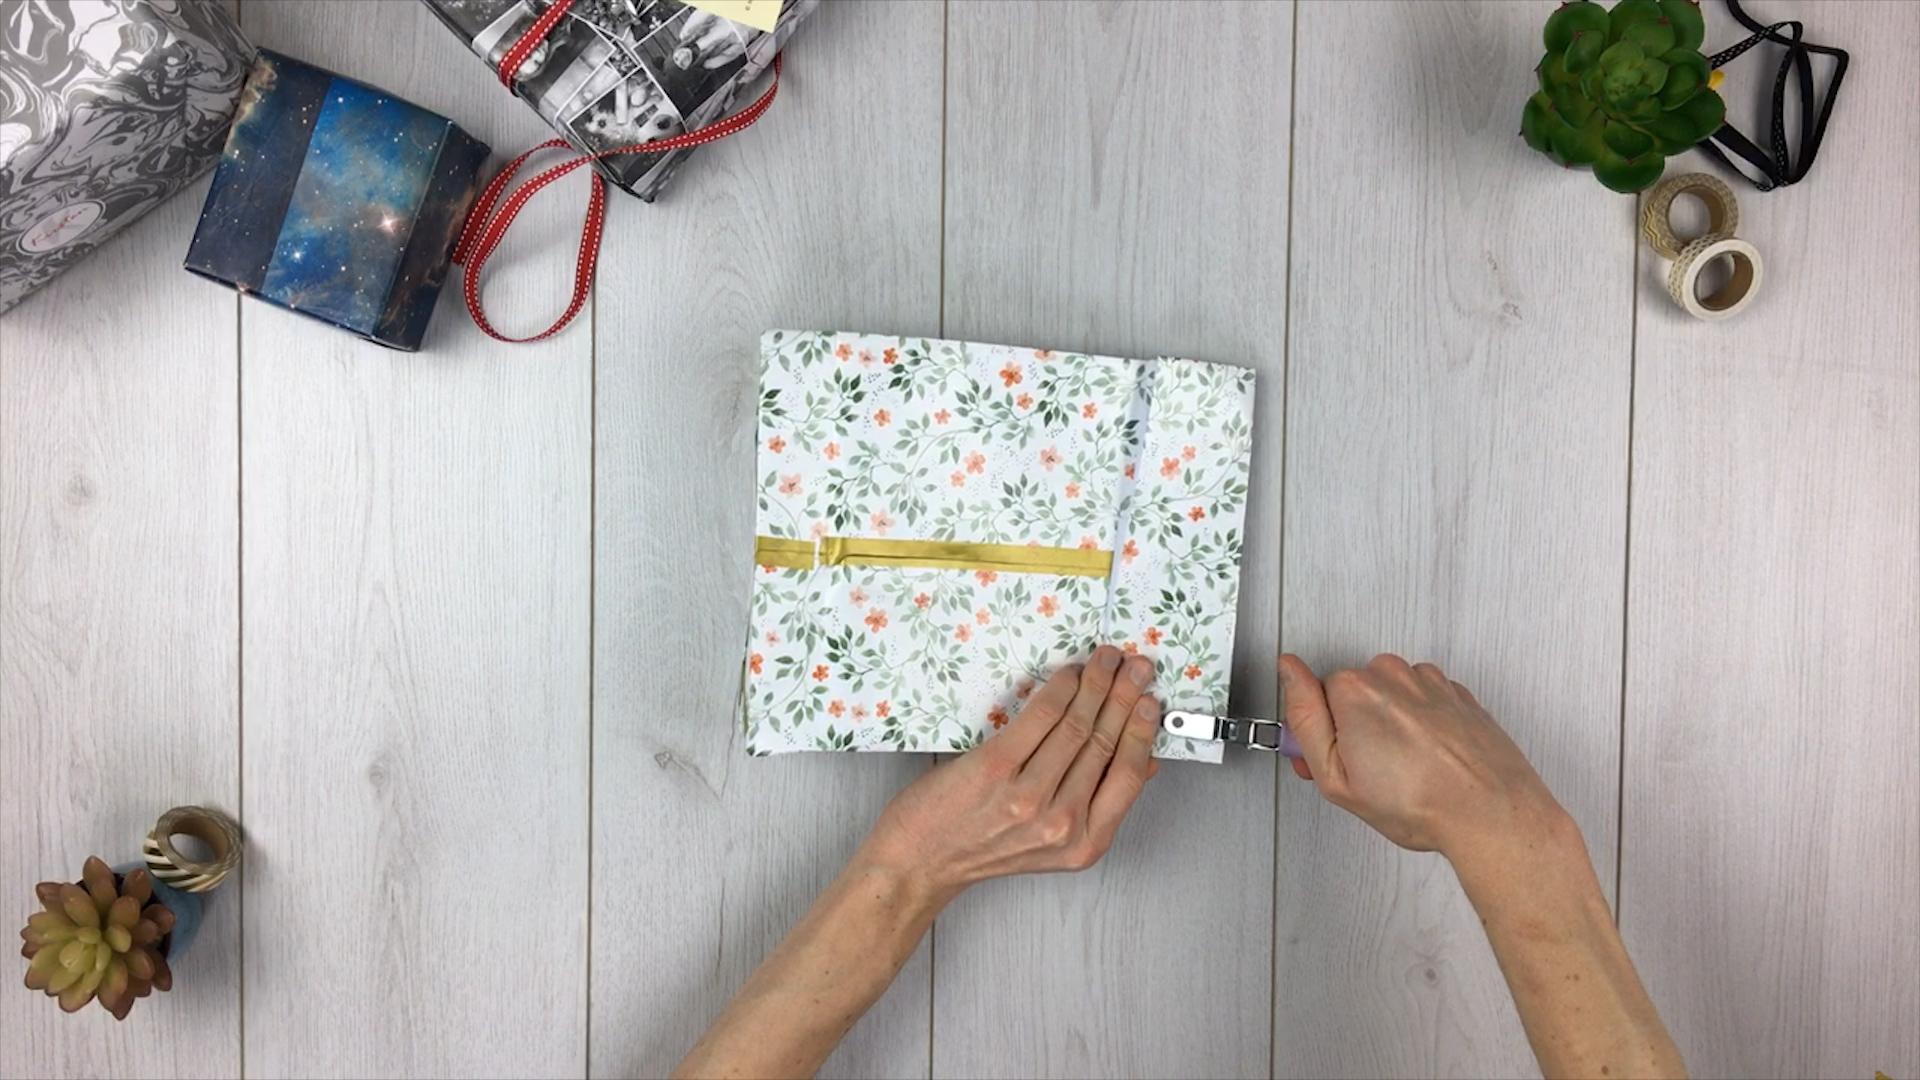 Geschenktüte basteln - Schritt 11